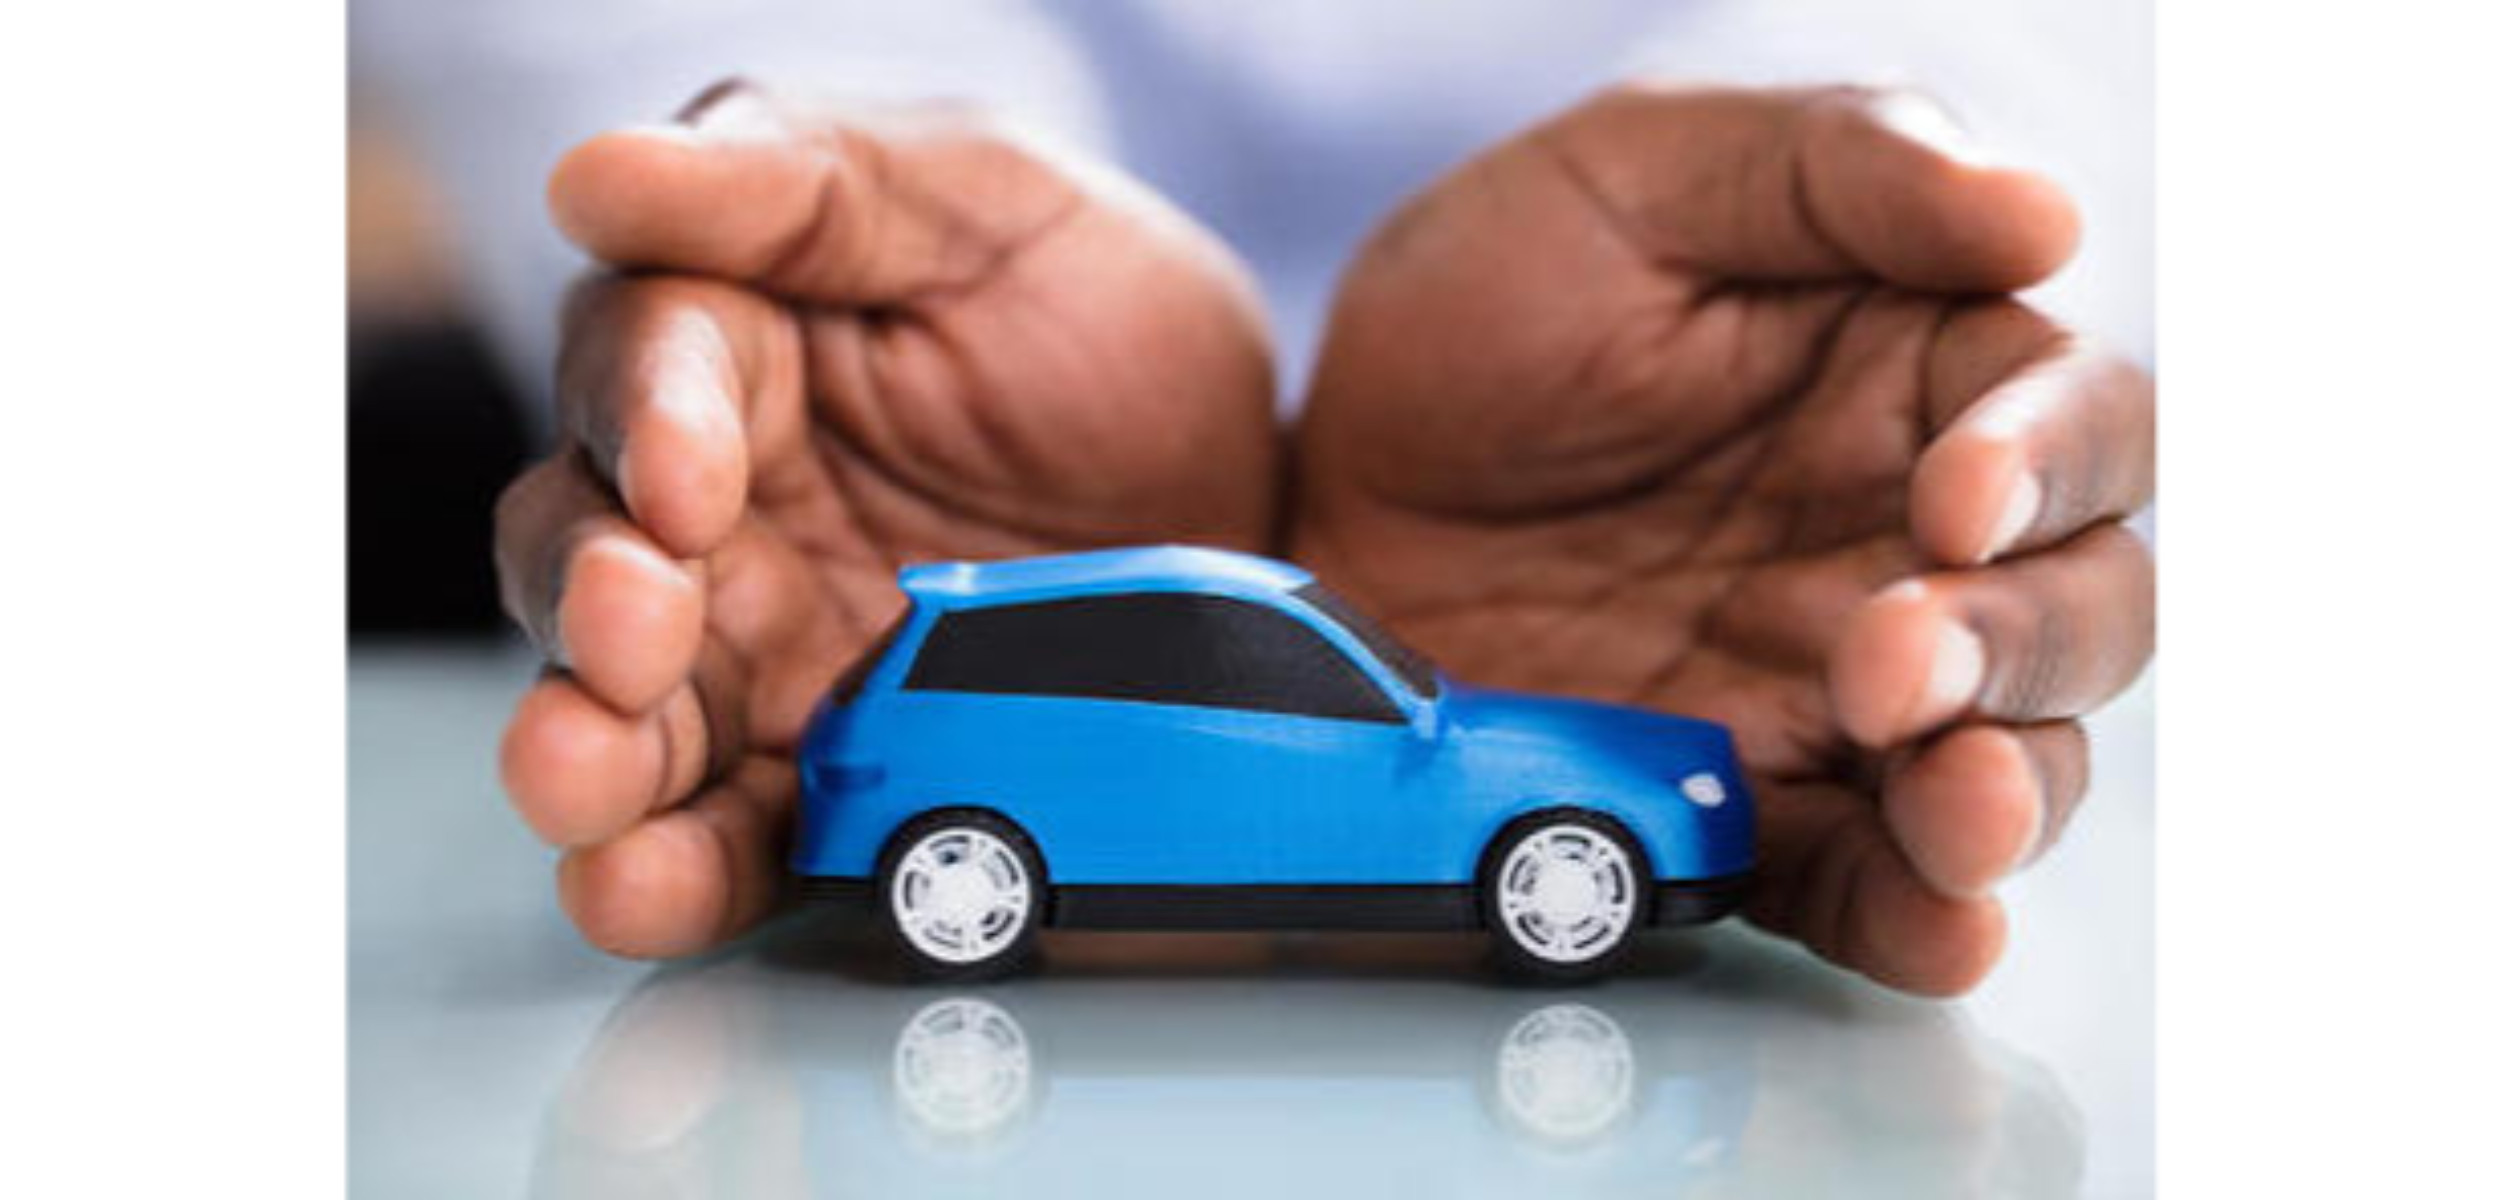 Assurance auto : une assurance pertinente ?